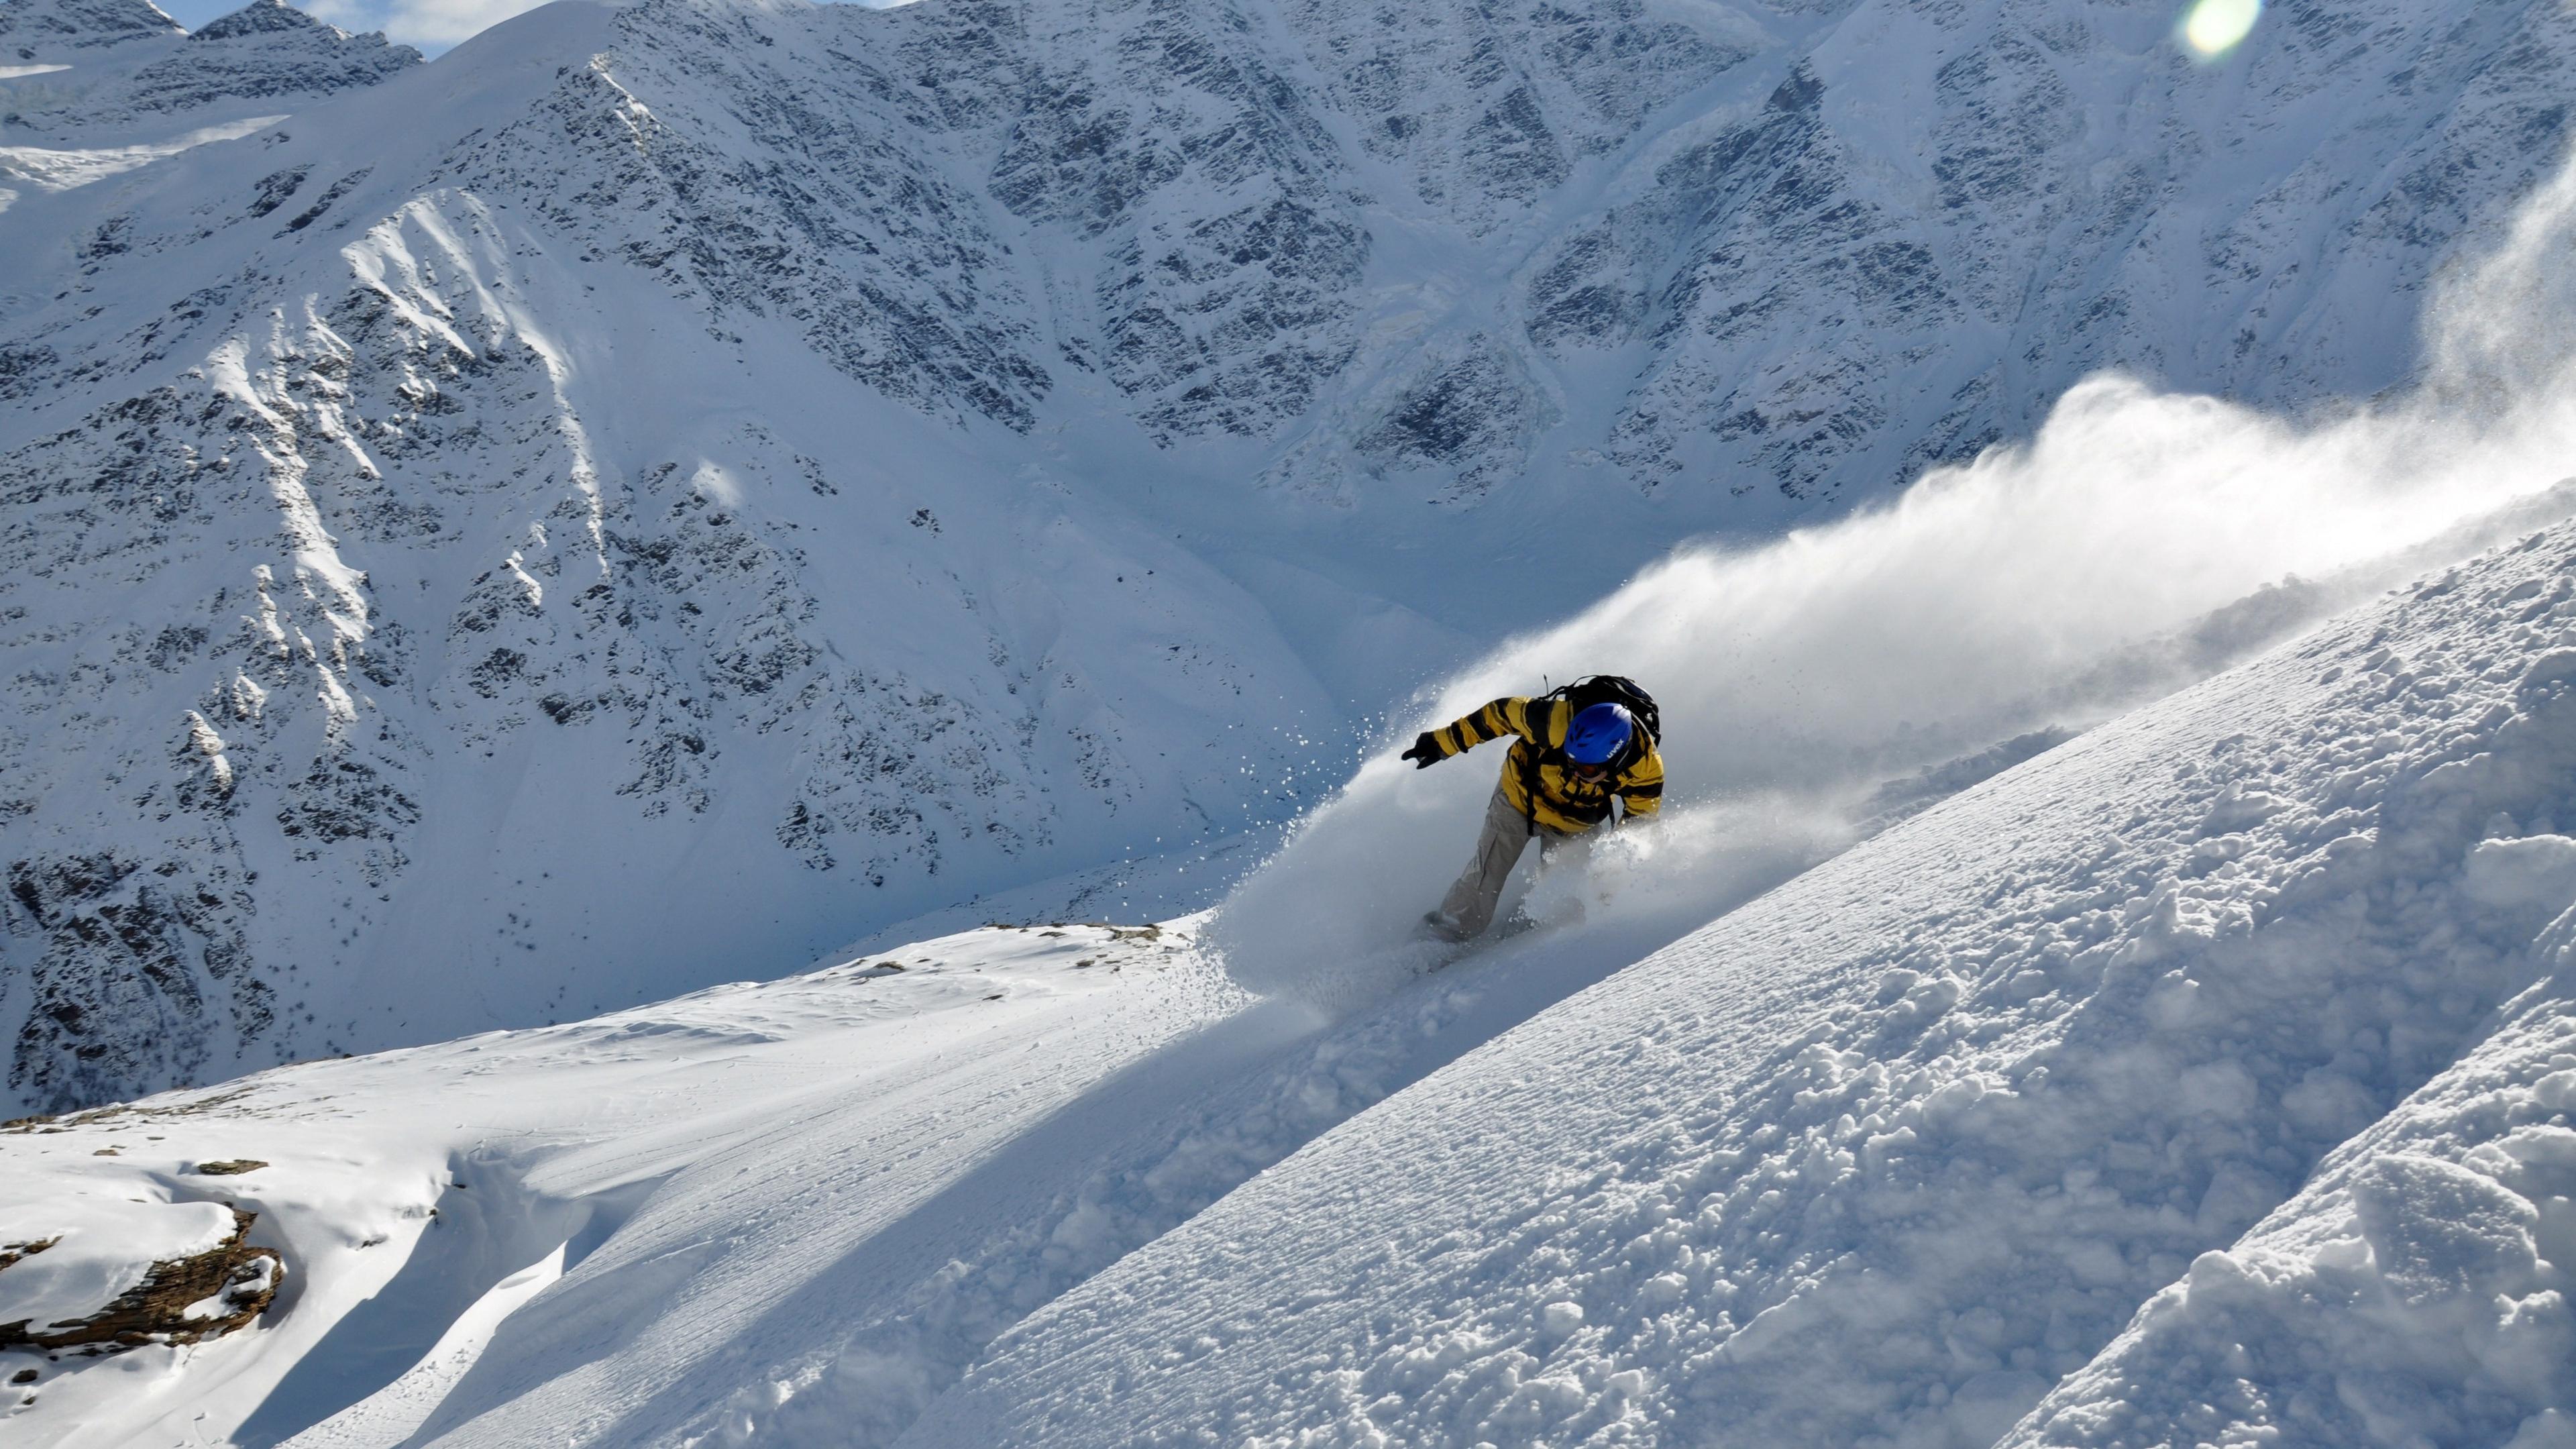 snowboarder snow mountains 4k 1540063277 - snowboarder, snow, mountains 4k - snowboarder, Snow, Mountains